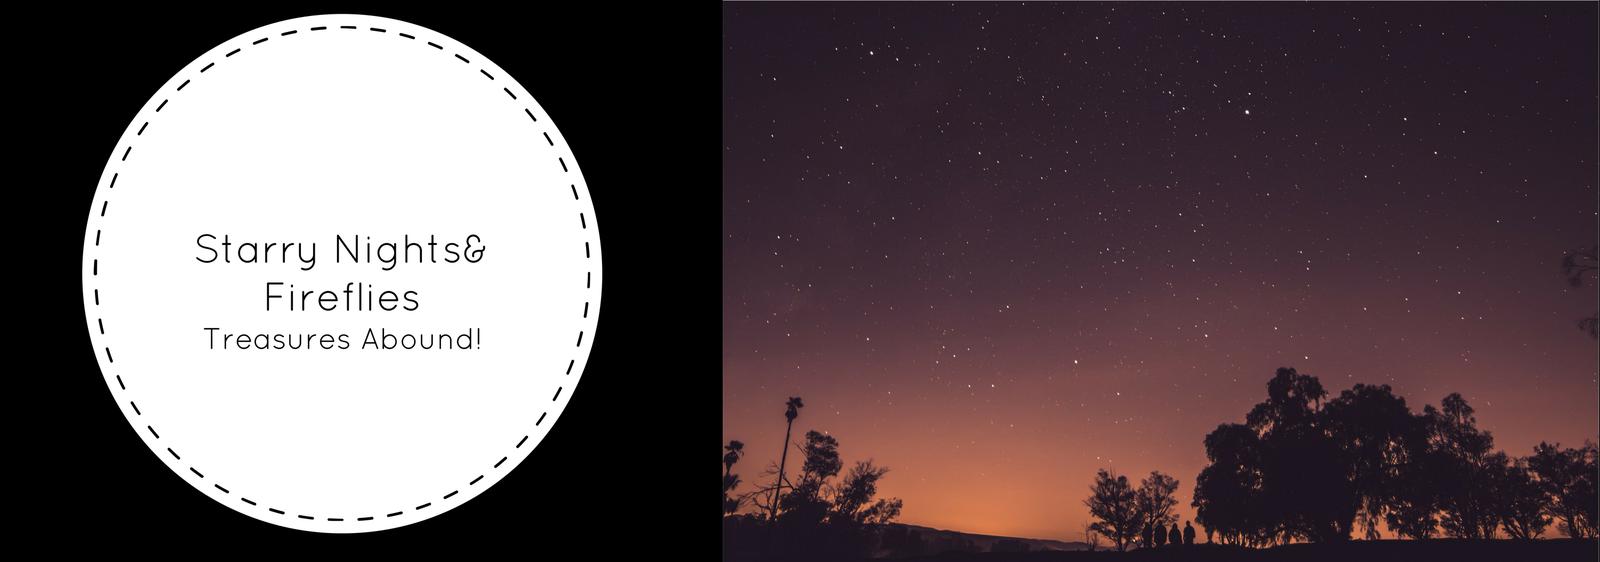 Starry Nights & Fireflies